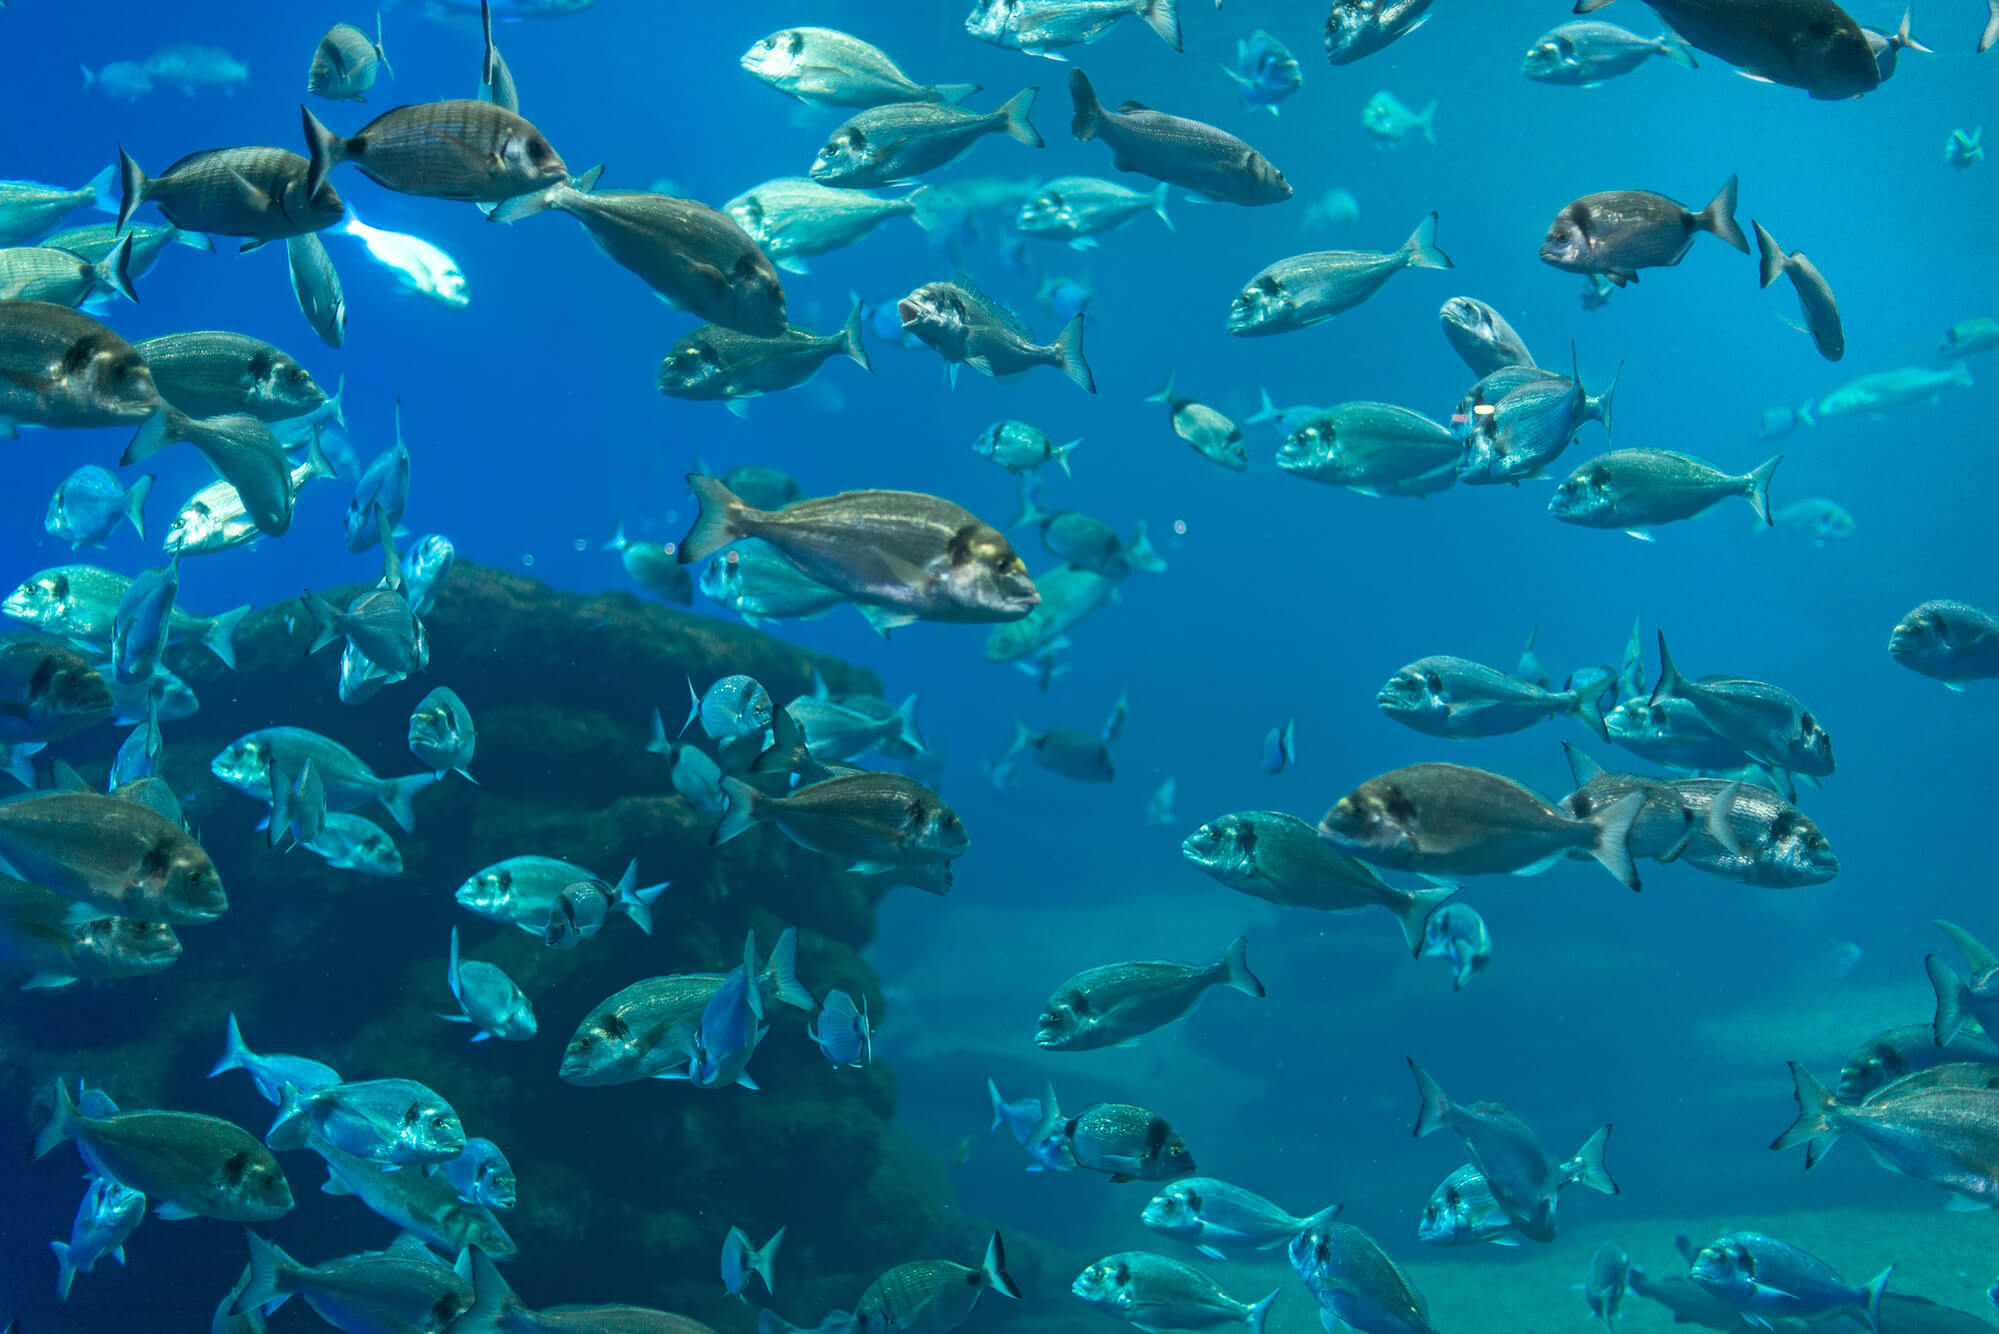 Lots of fish in sea - fish finder GPS